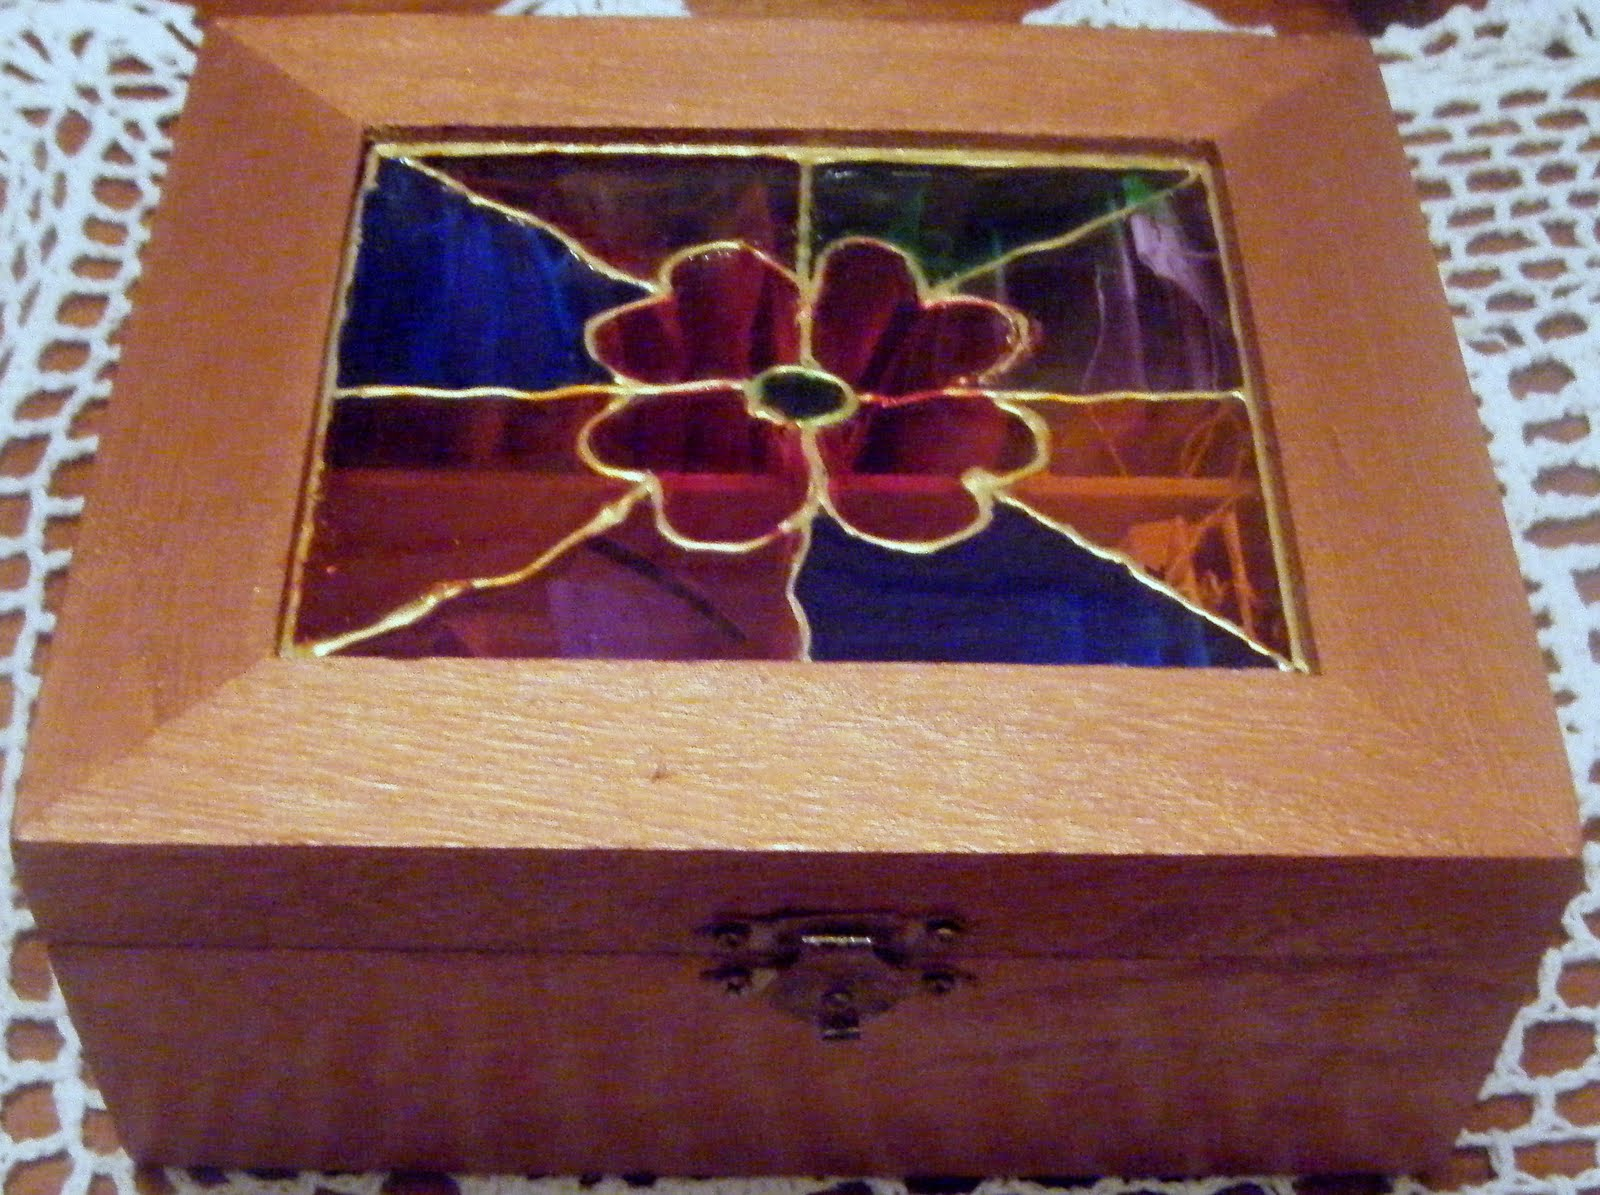 Manualidades de mari caja de madera para infusiones paso a paso - Cajas madera para manualidades ...